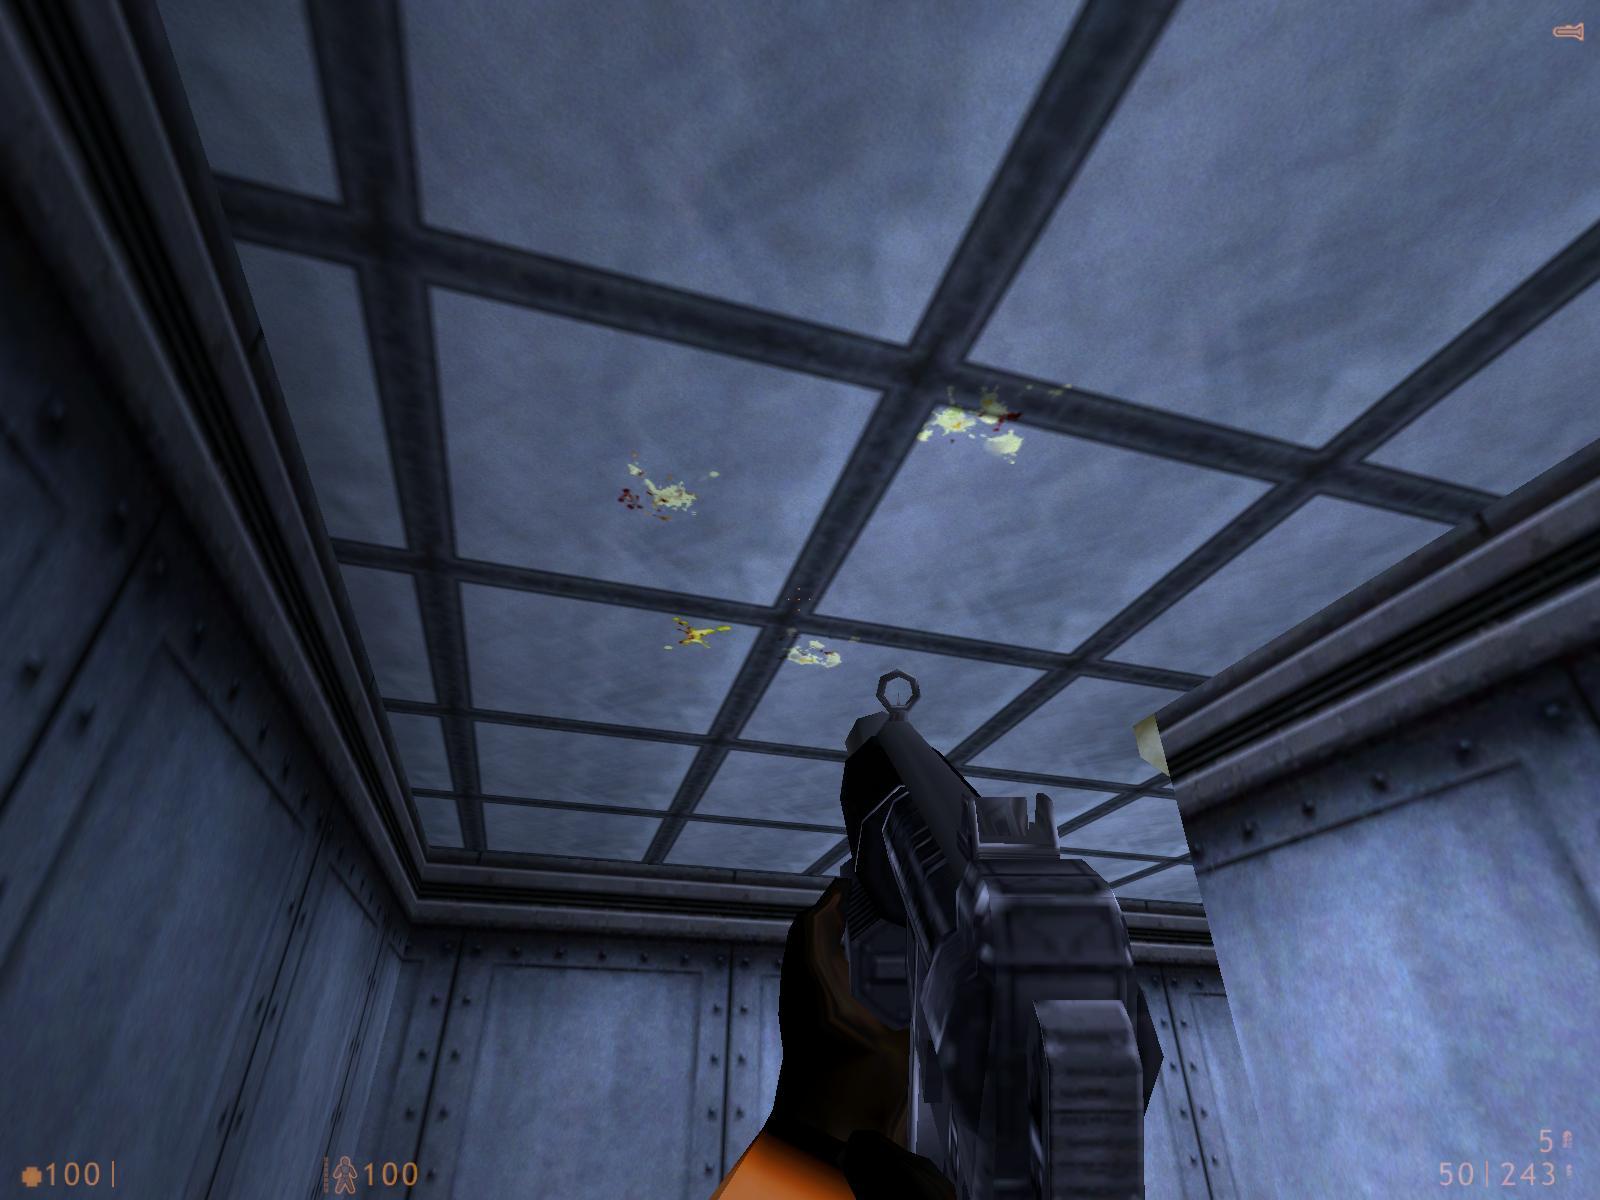 0H7YflTxu7I.jpg - Half-Life